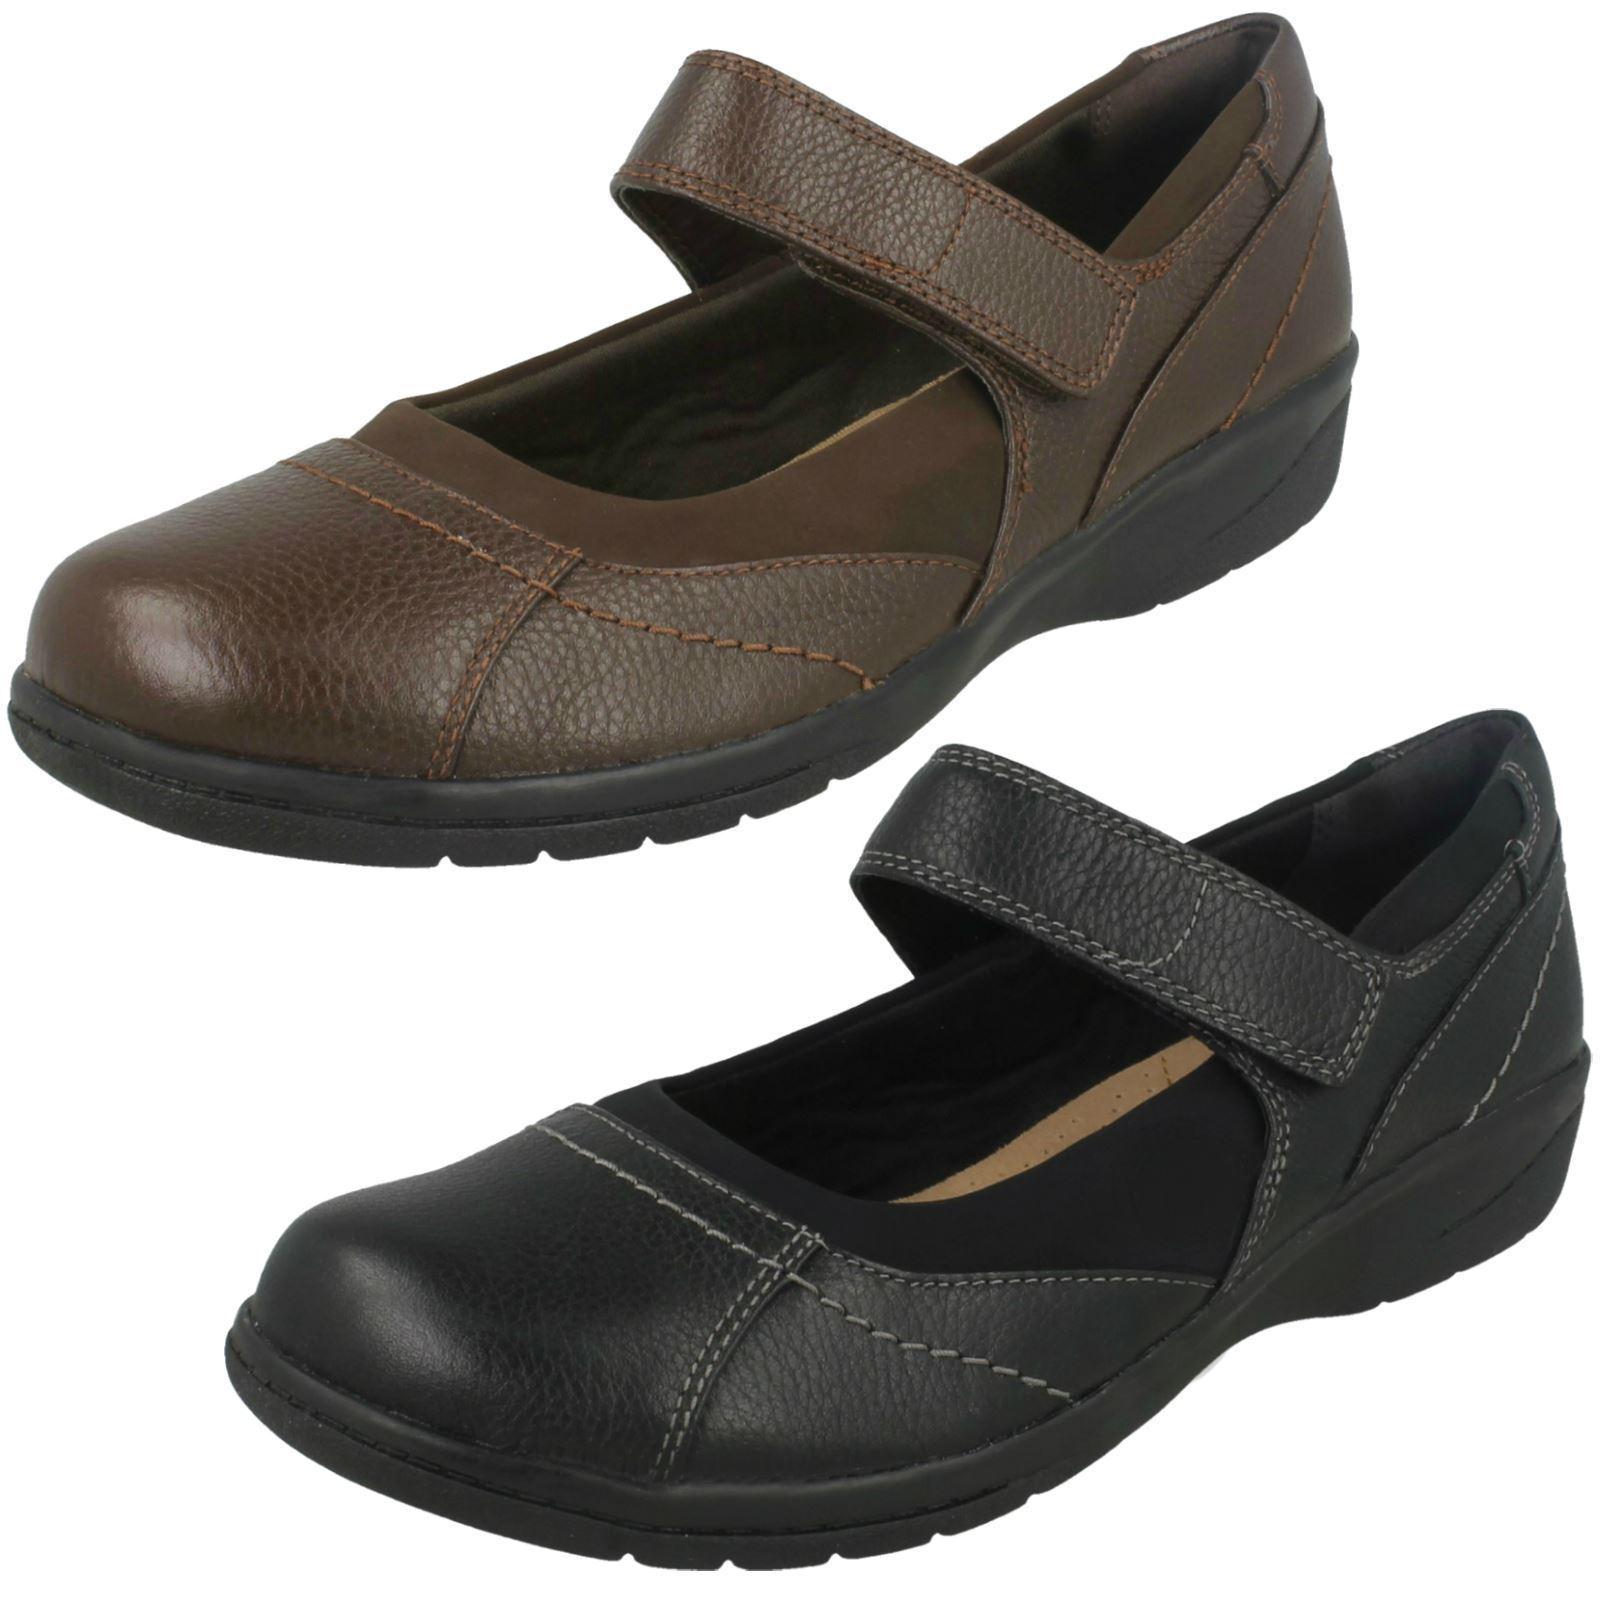 Donna - CLARKS scarpe in pelle - Donna CHEYN rete d508a8